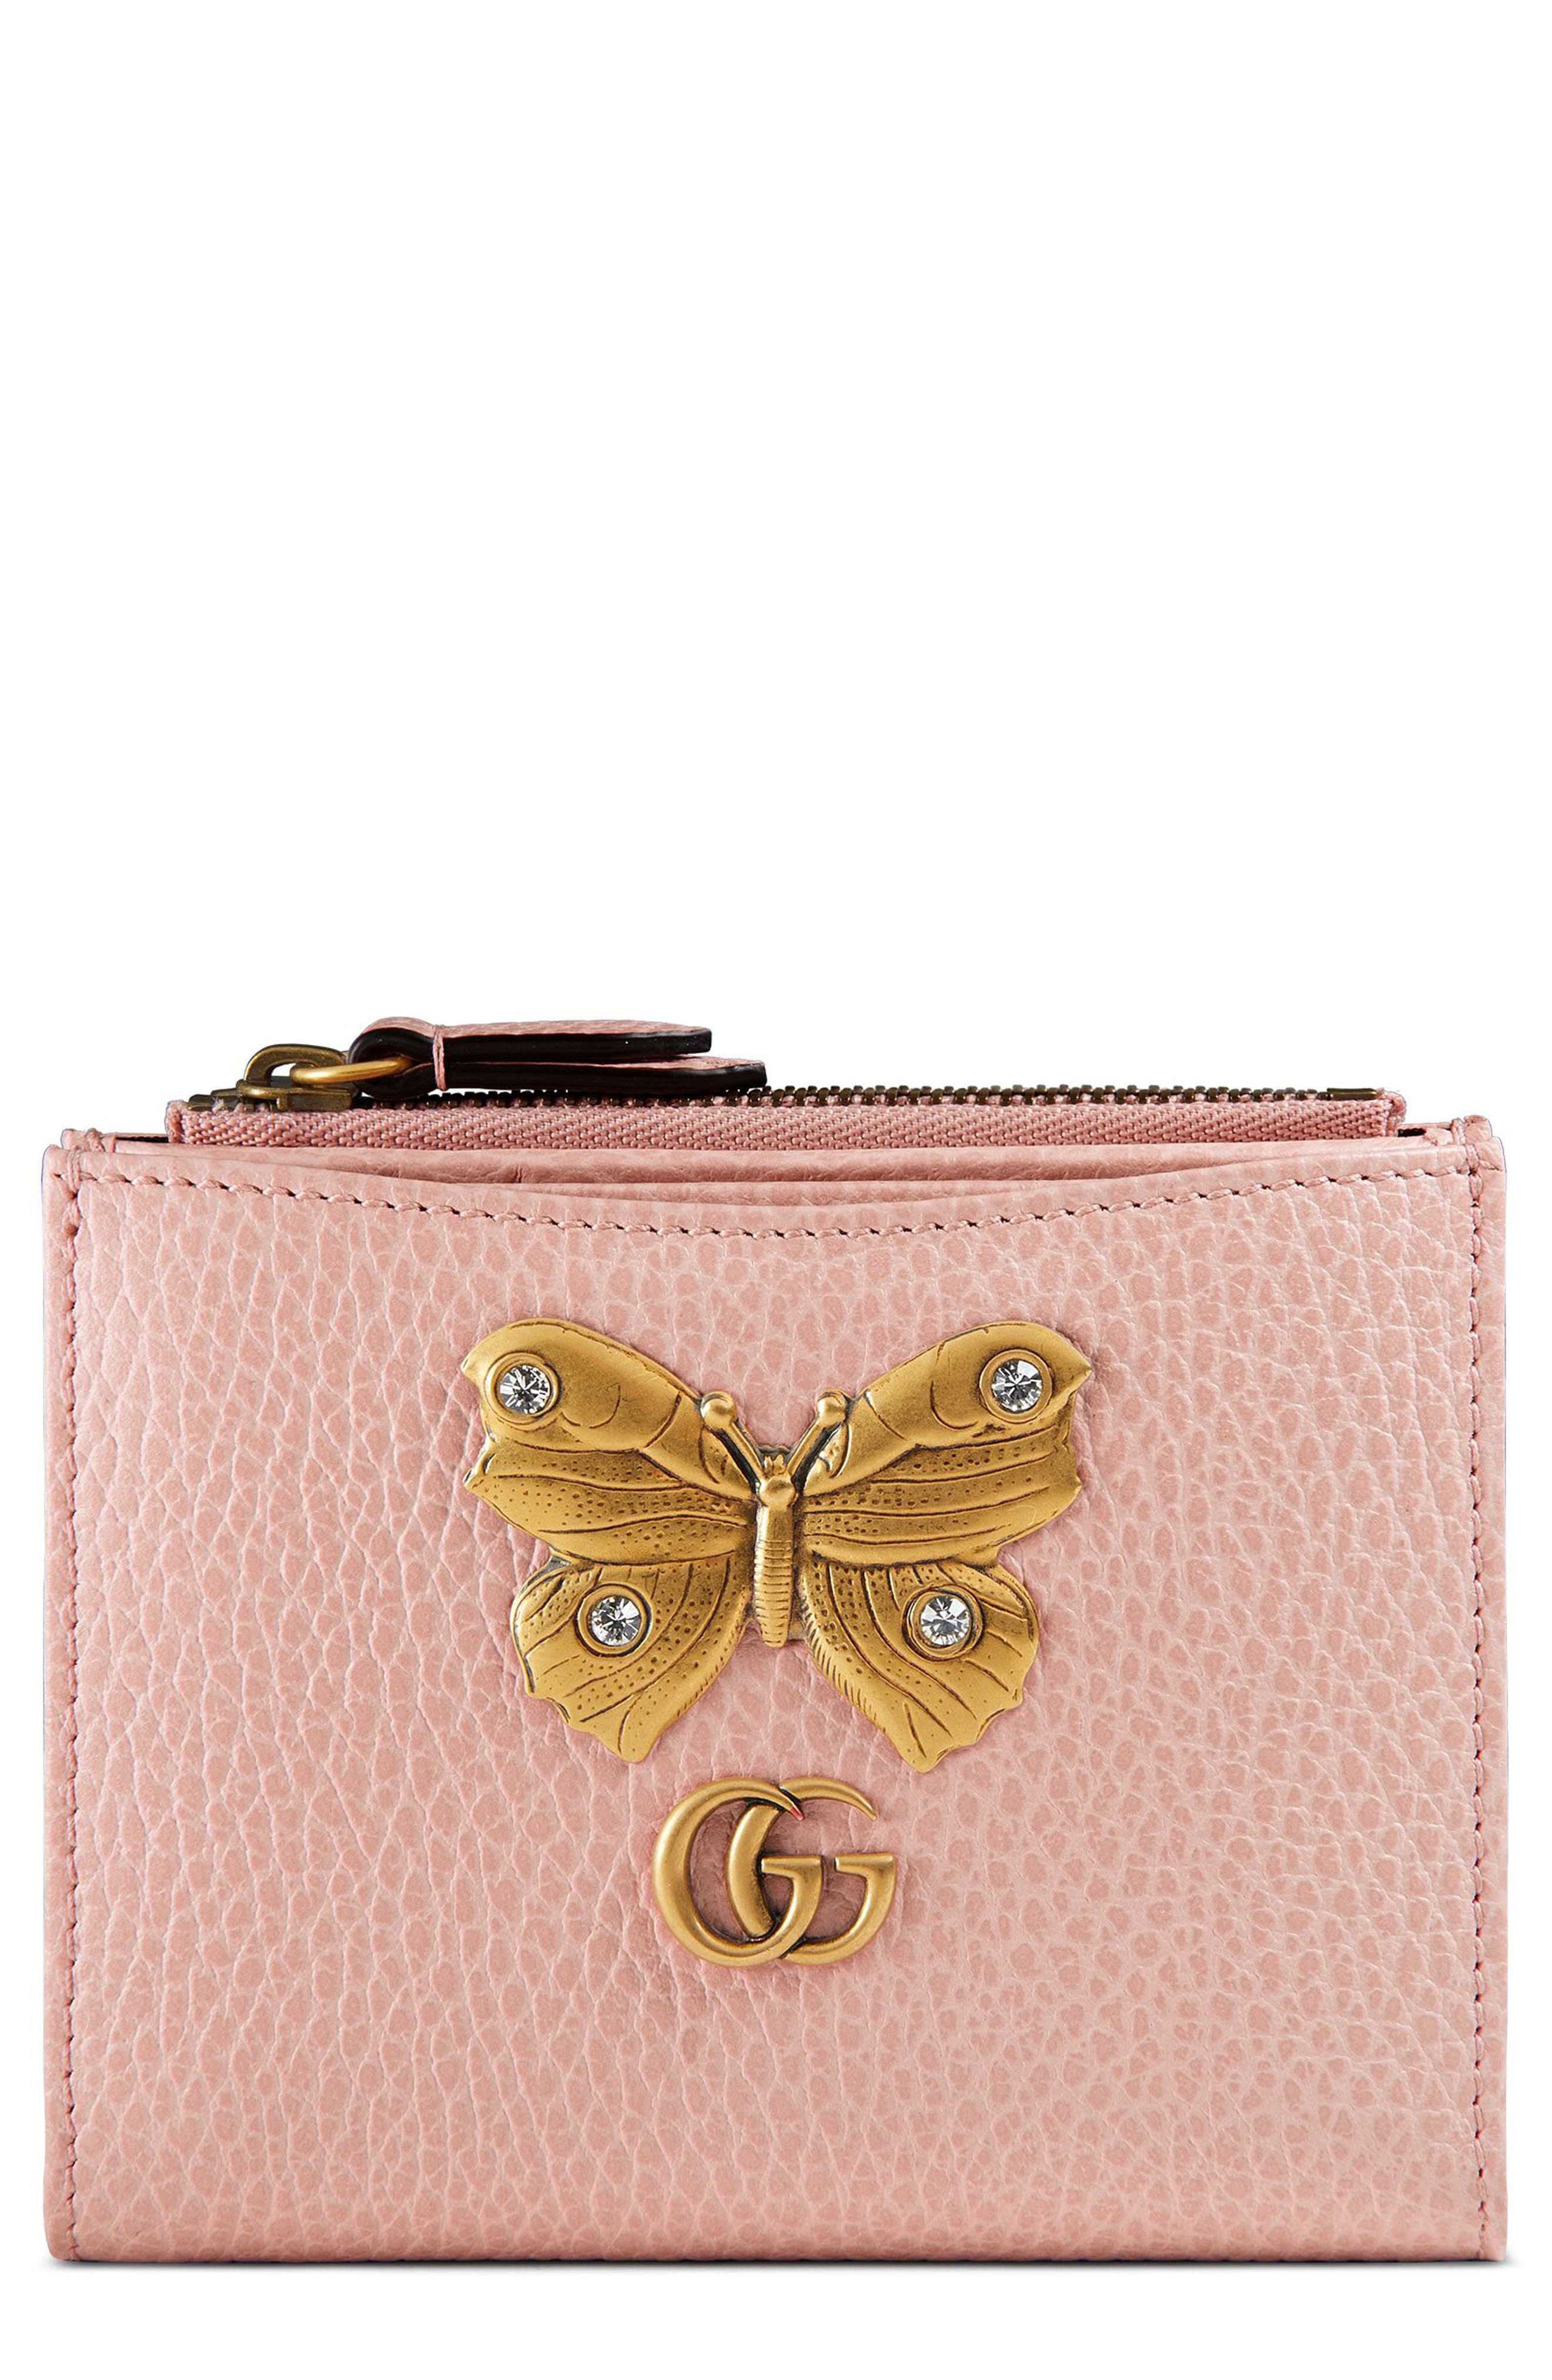 Gucci Farfalla Leather Wallet